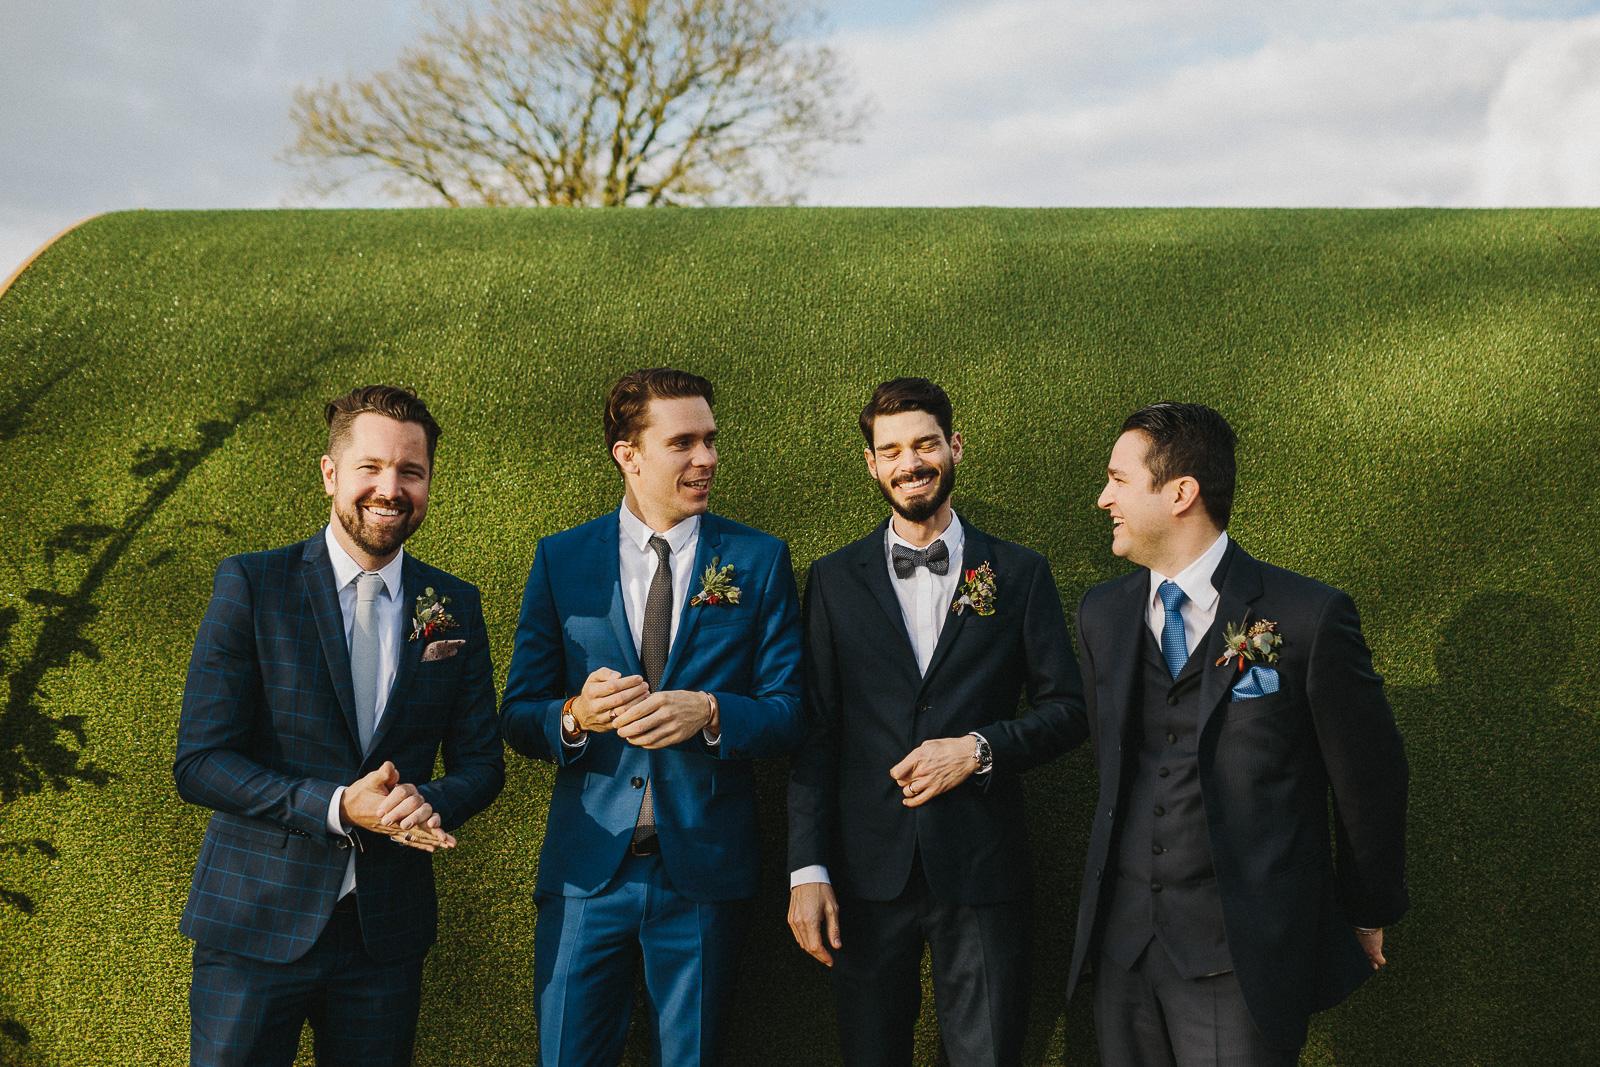 Cloughjordan+Weddings+Ireland.48.JPG